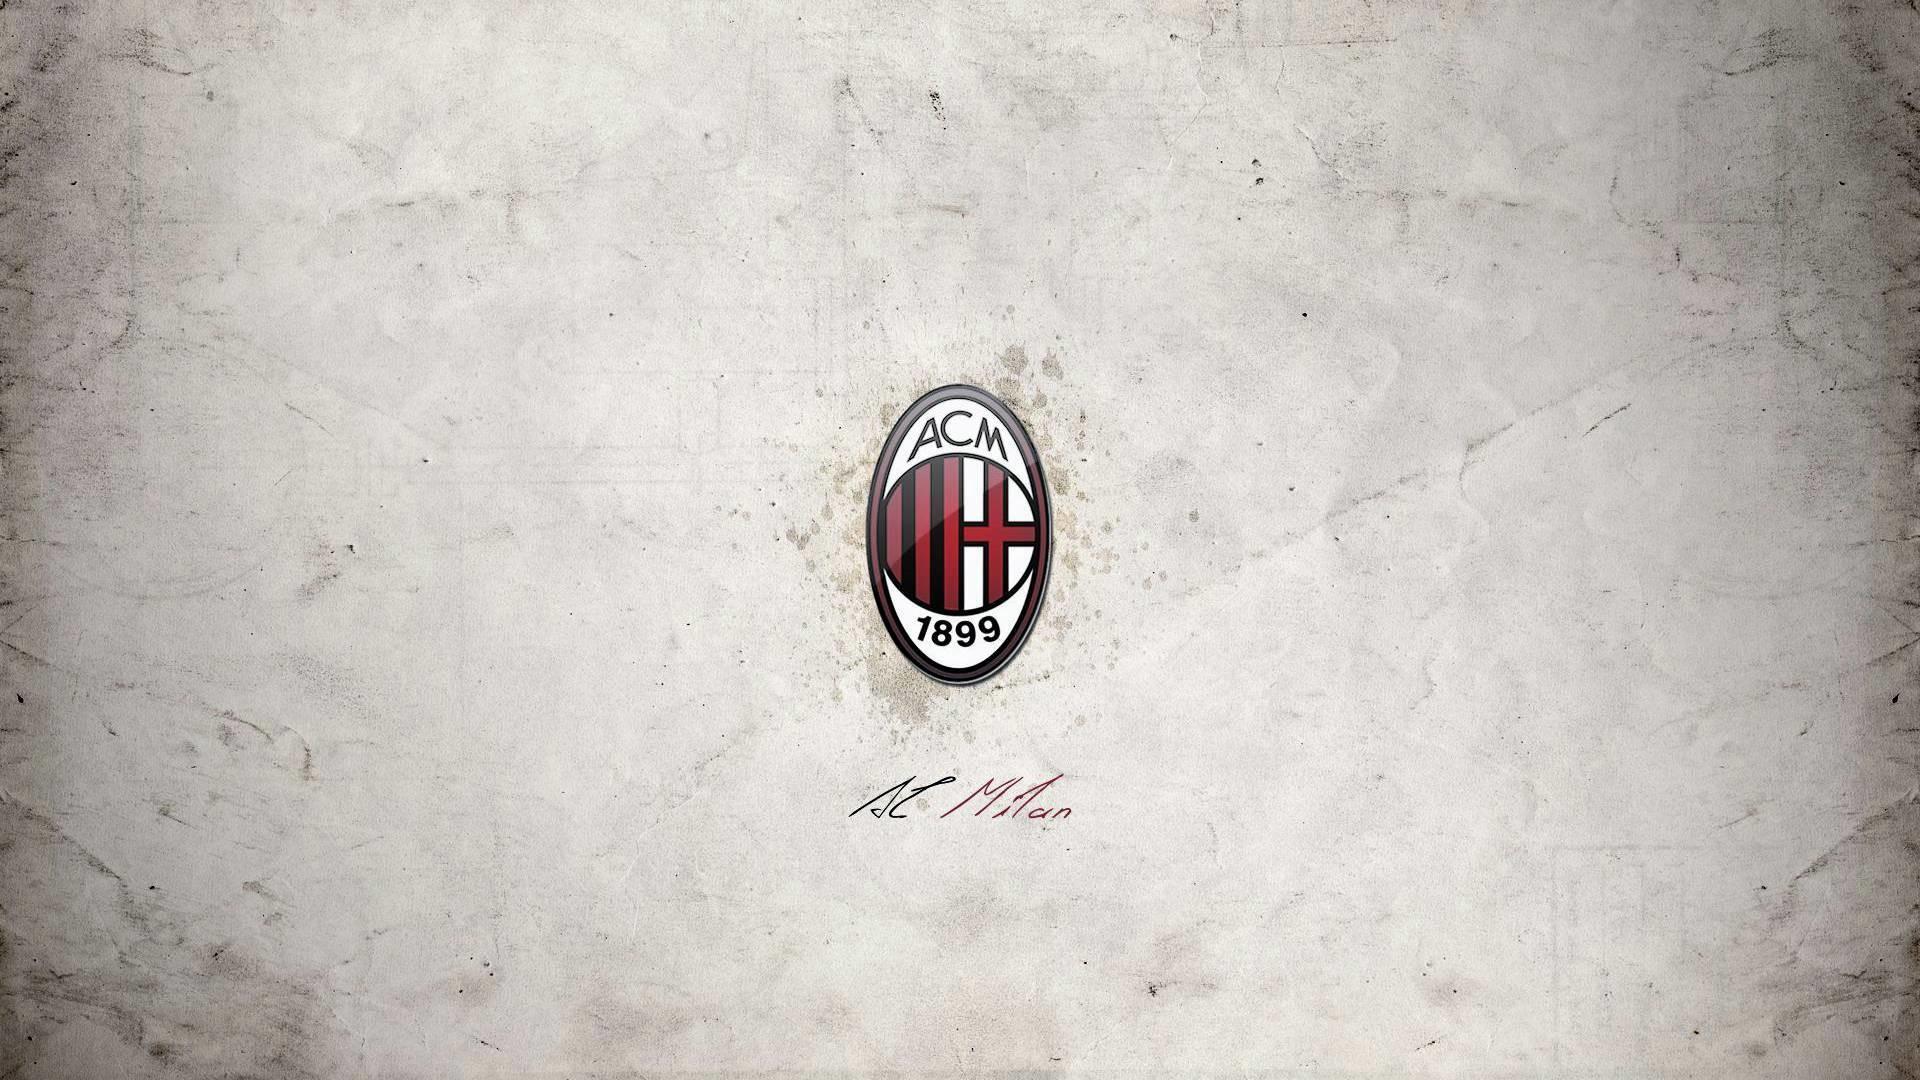 High Resolution AC Milan Logo Wallpaper HD Picture For Desktop .